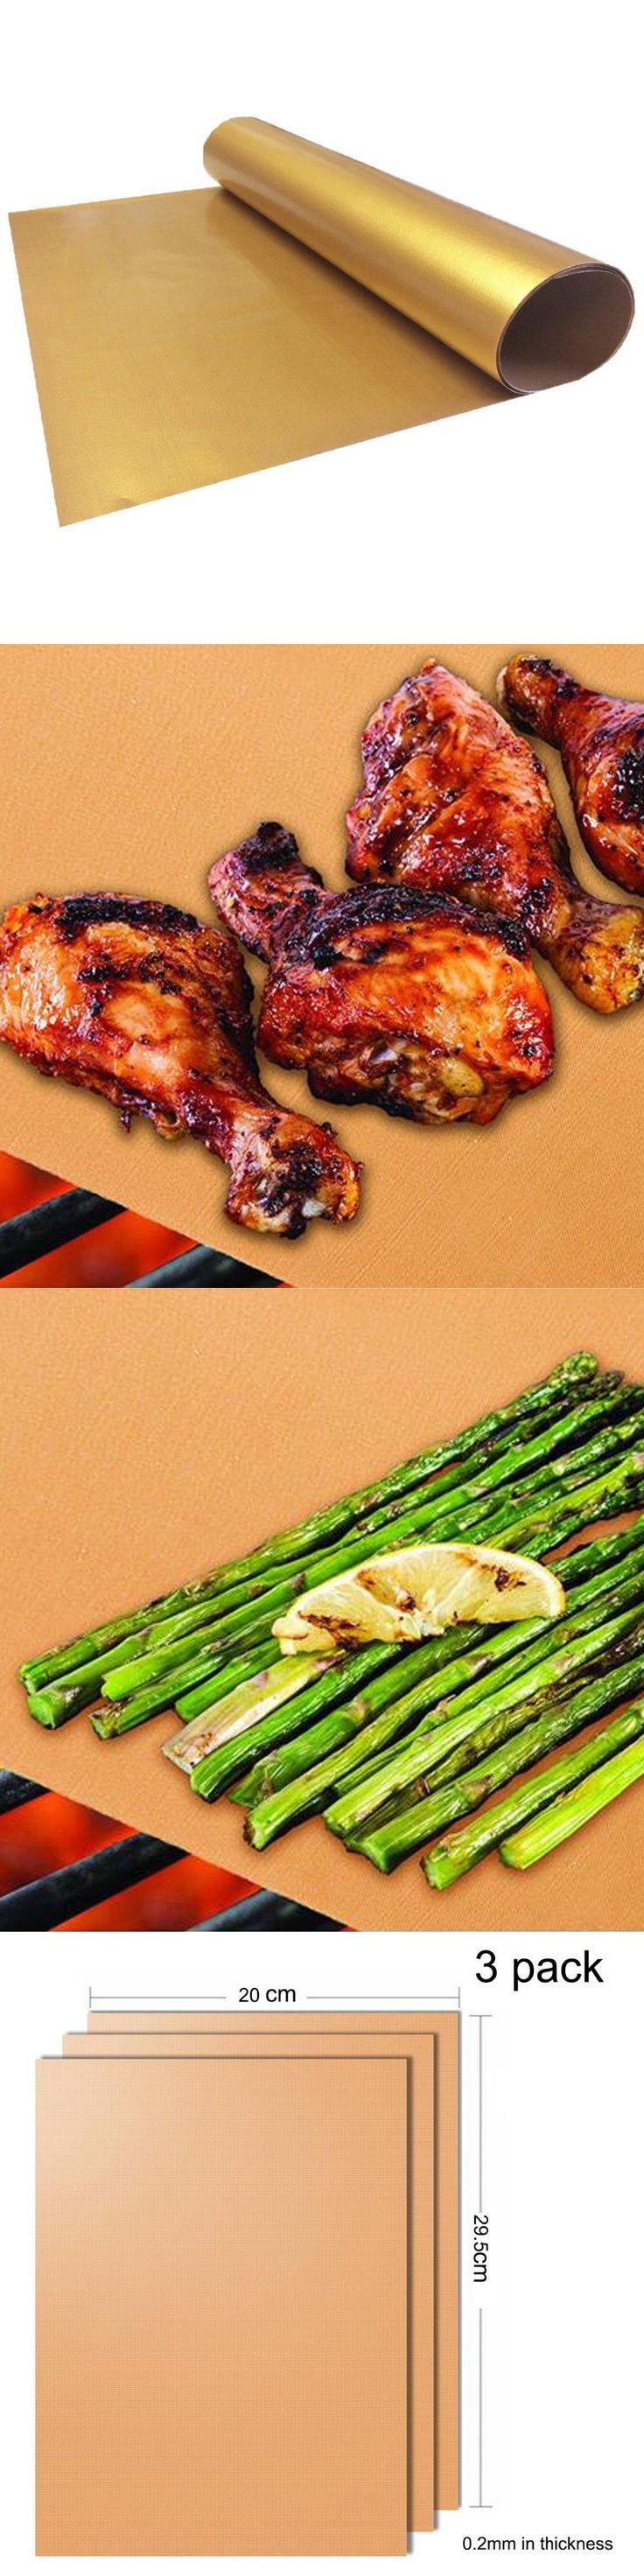 3Pcs Gold Resuable Teflon BBQ Mat Baking Grill Mat Heat-resistant Baking Mat Non-stick BBQ Liner Teflon Baking Sheet